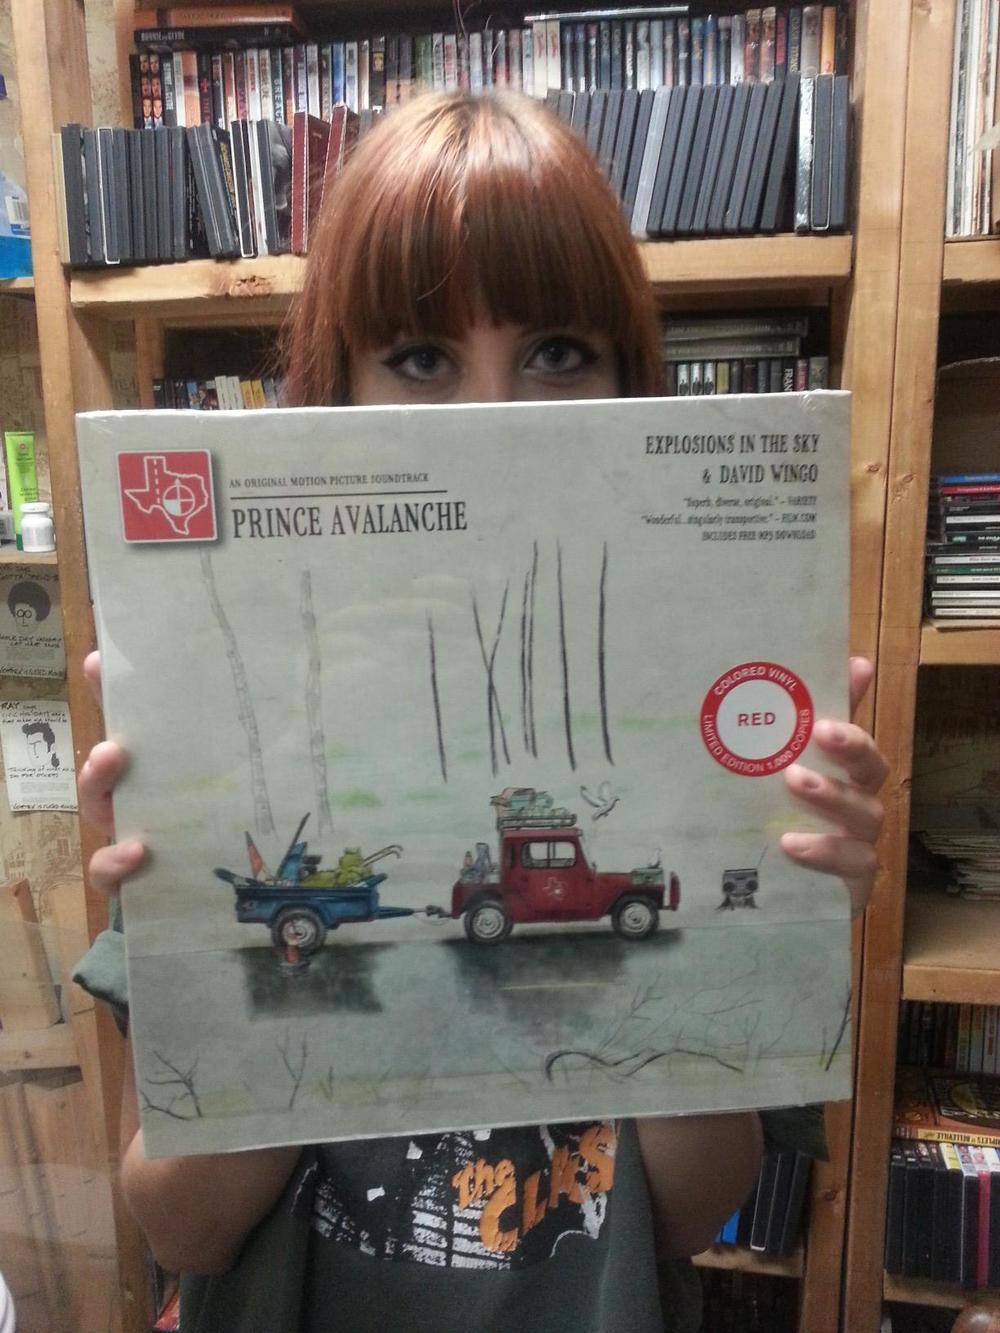 Explosions in the Sky Vinyl